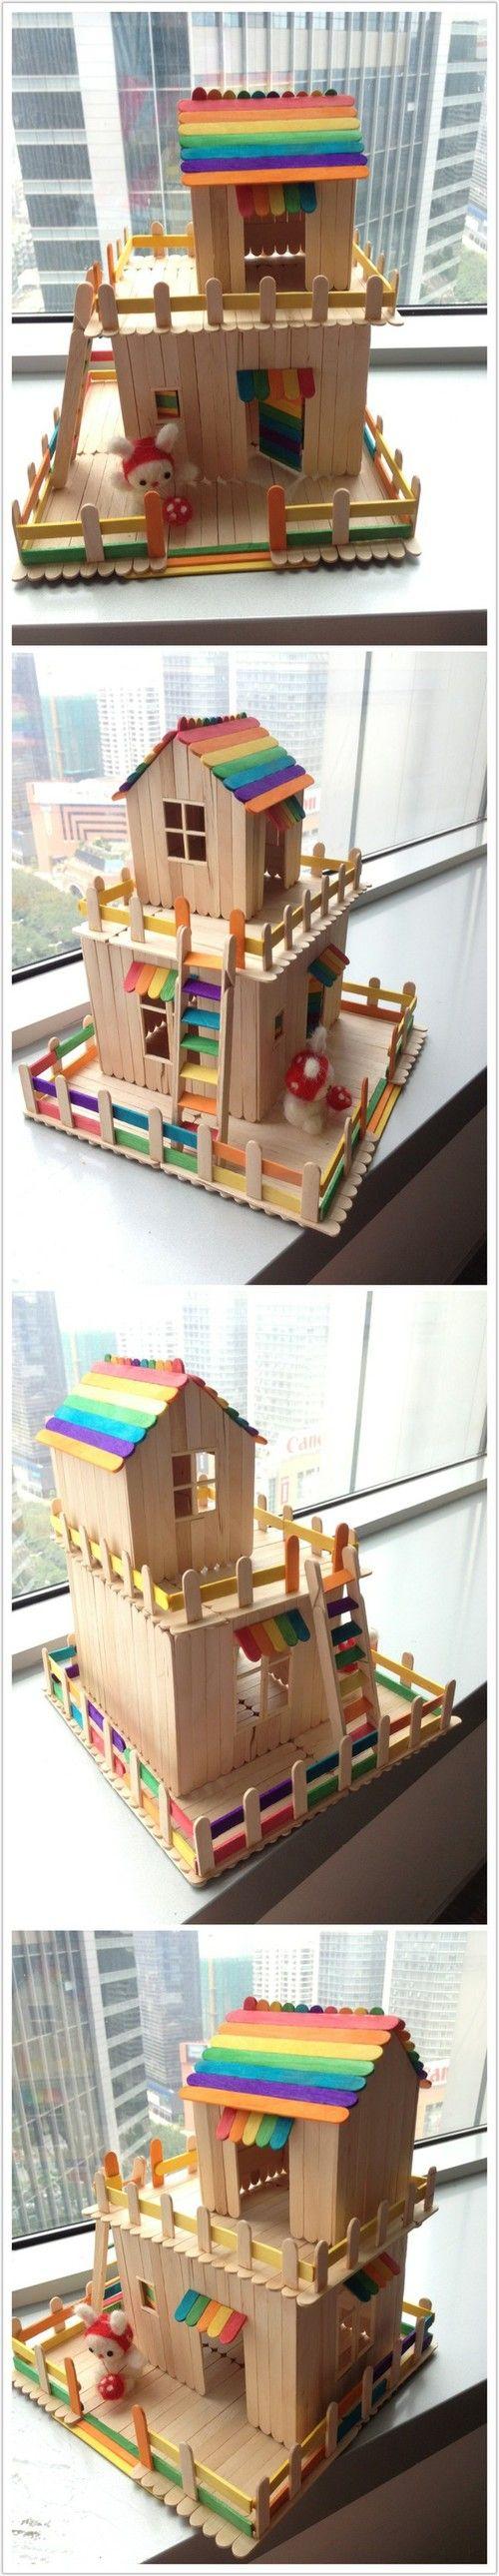 Rainbow popsicle sticks